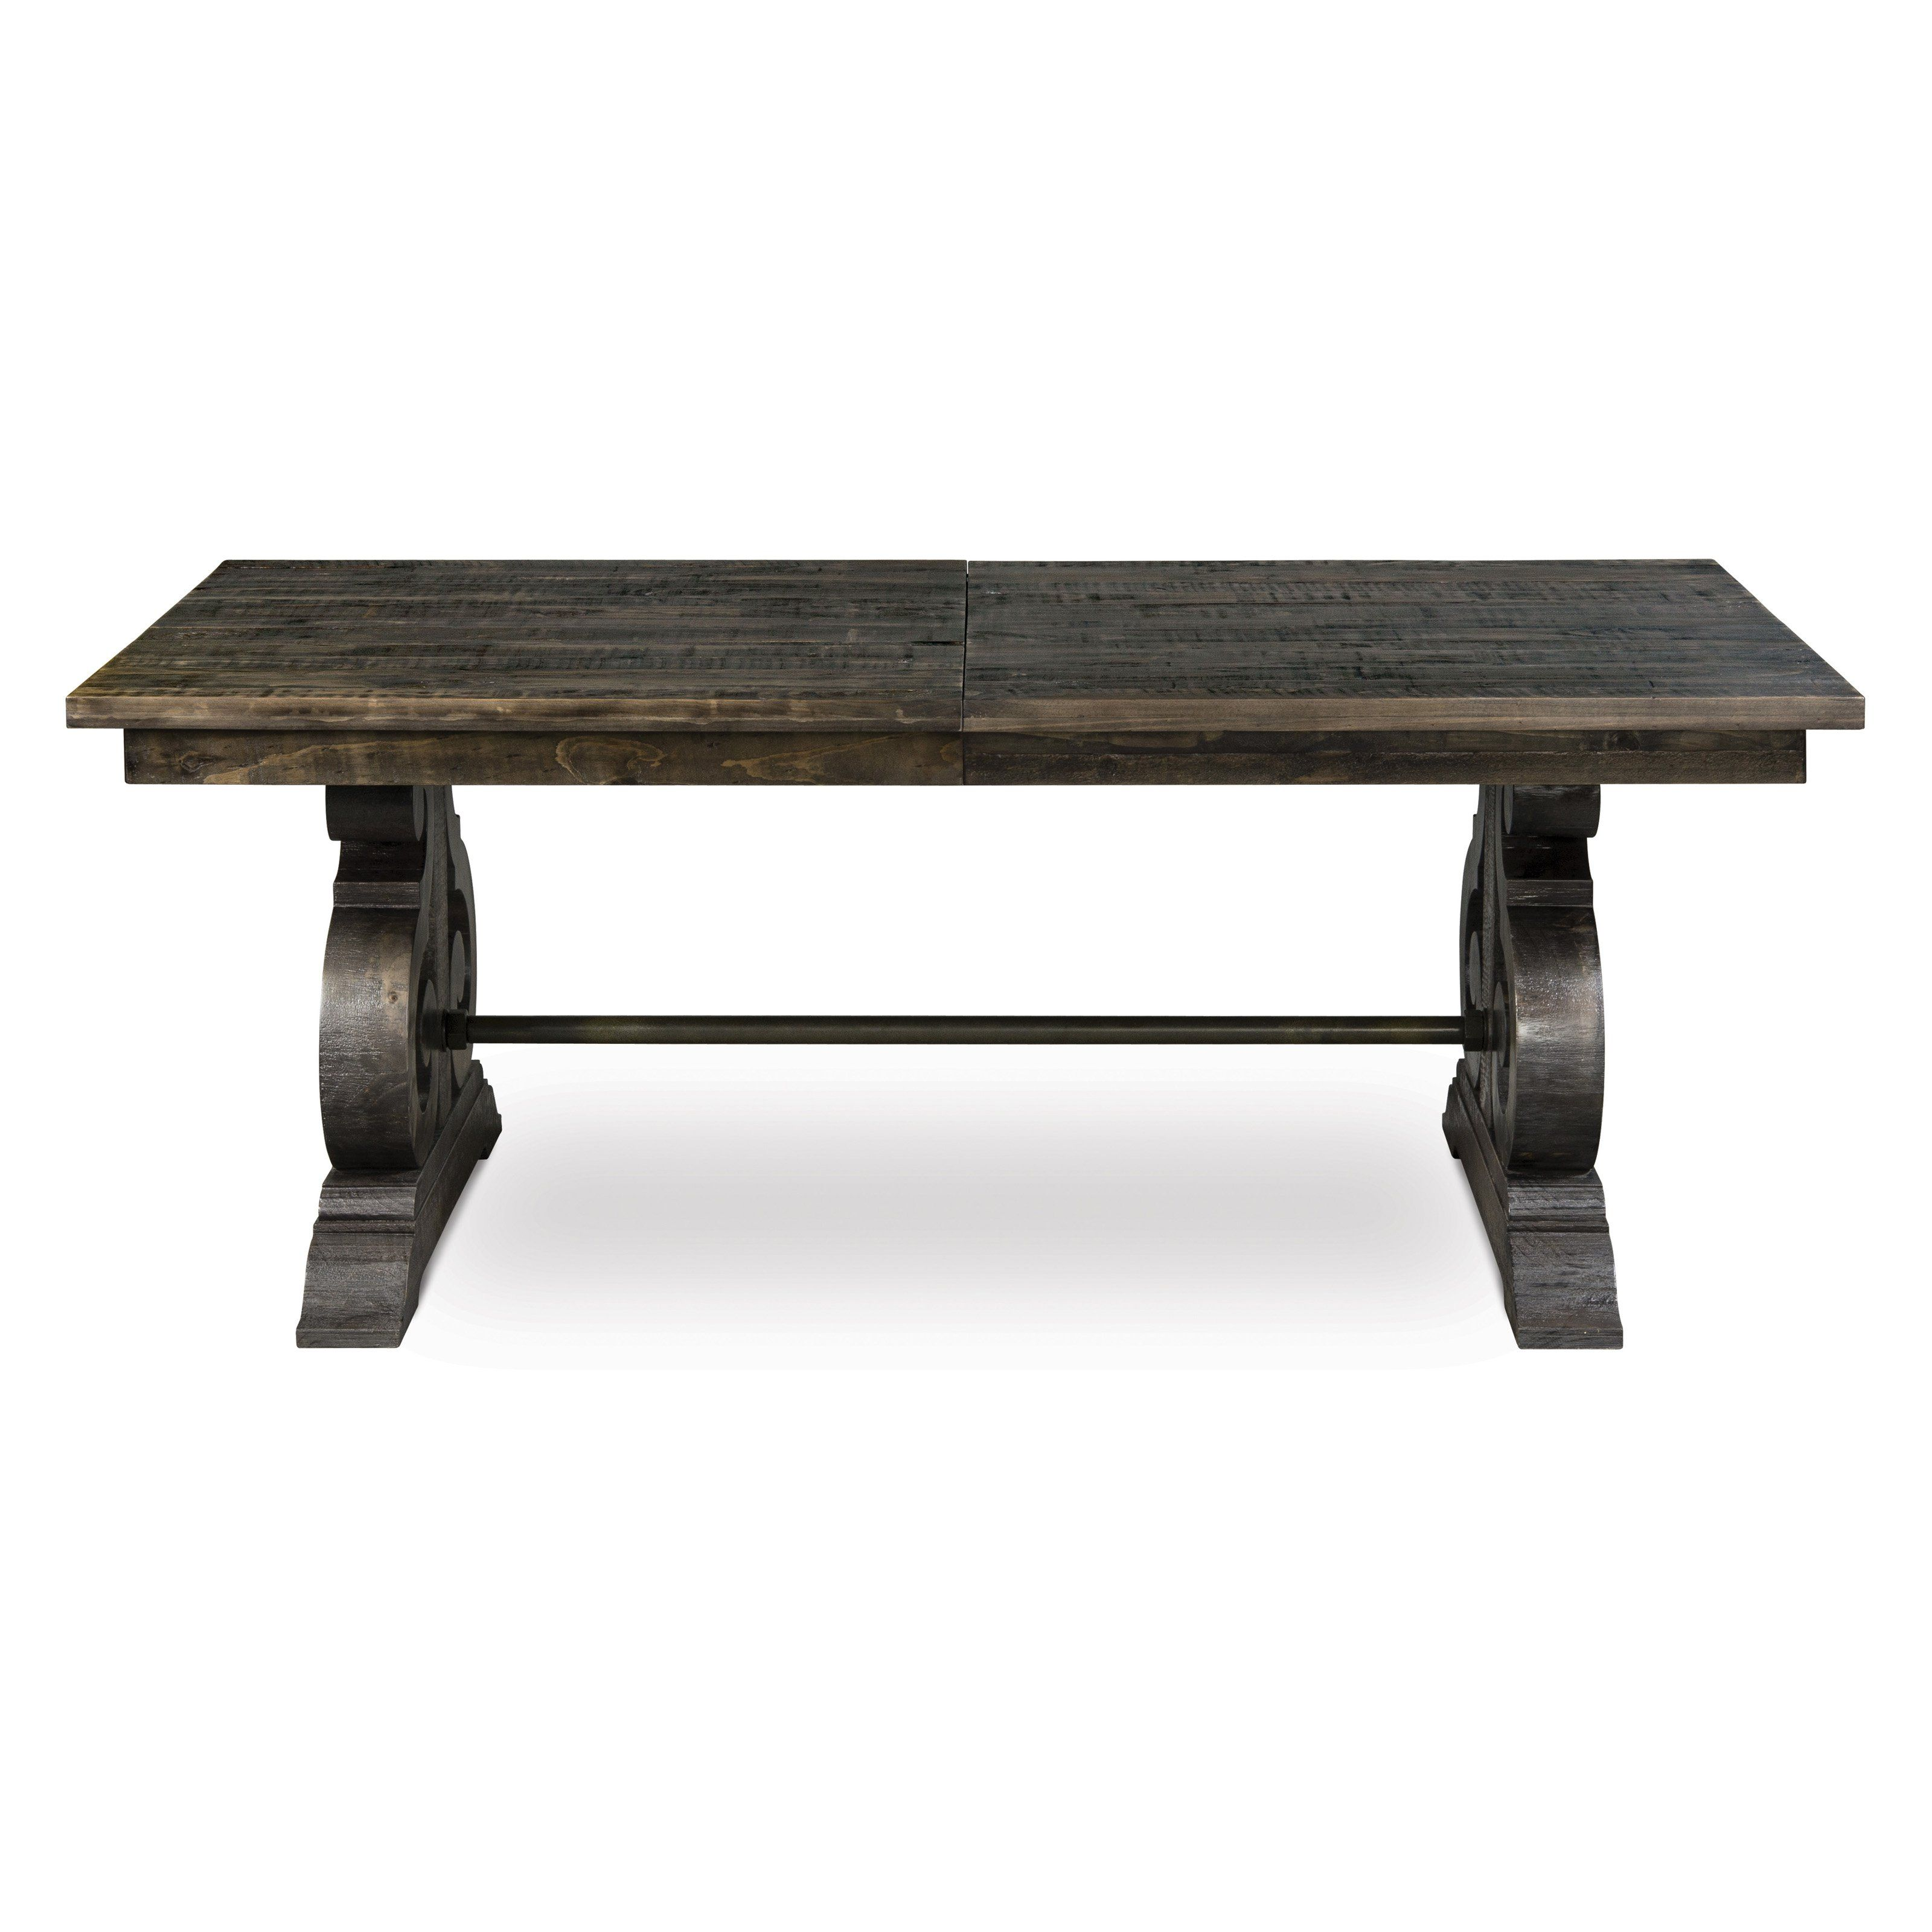 Magnussen Bellamy Wood Rectangular Dining Table - Rustic and regal ...